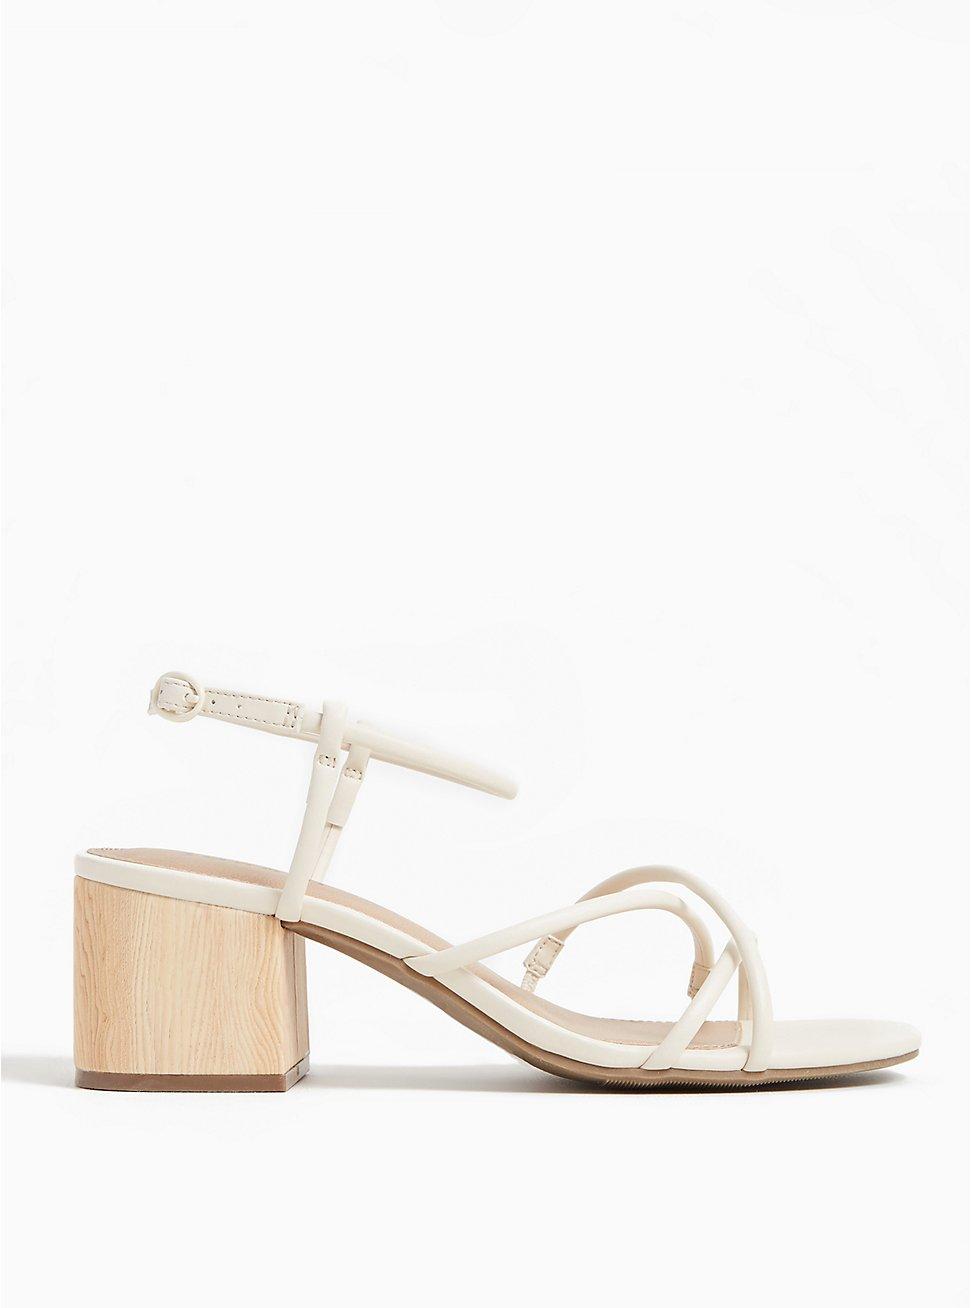 Plus Size Ivory Faux Leather Strappy Woodgrain Block Heel (WW), , hi-res